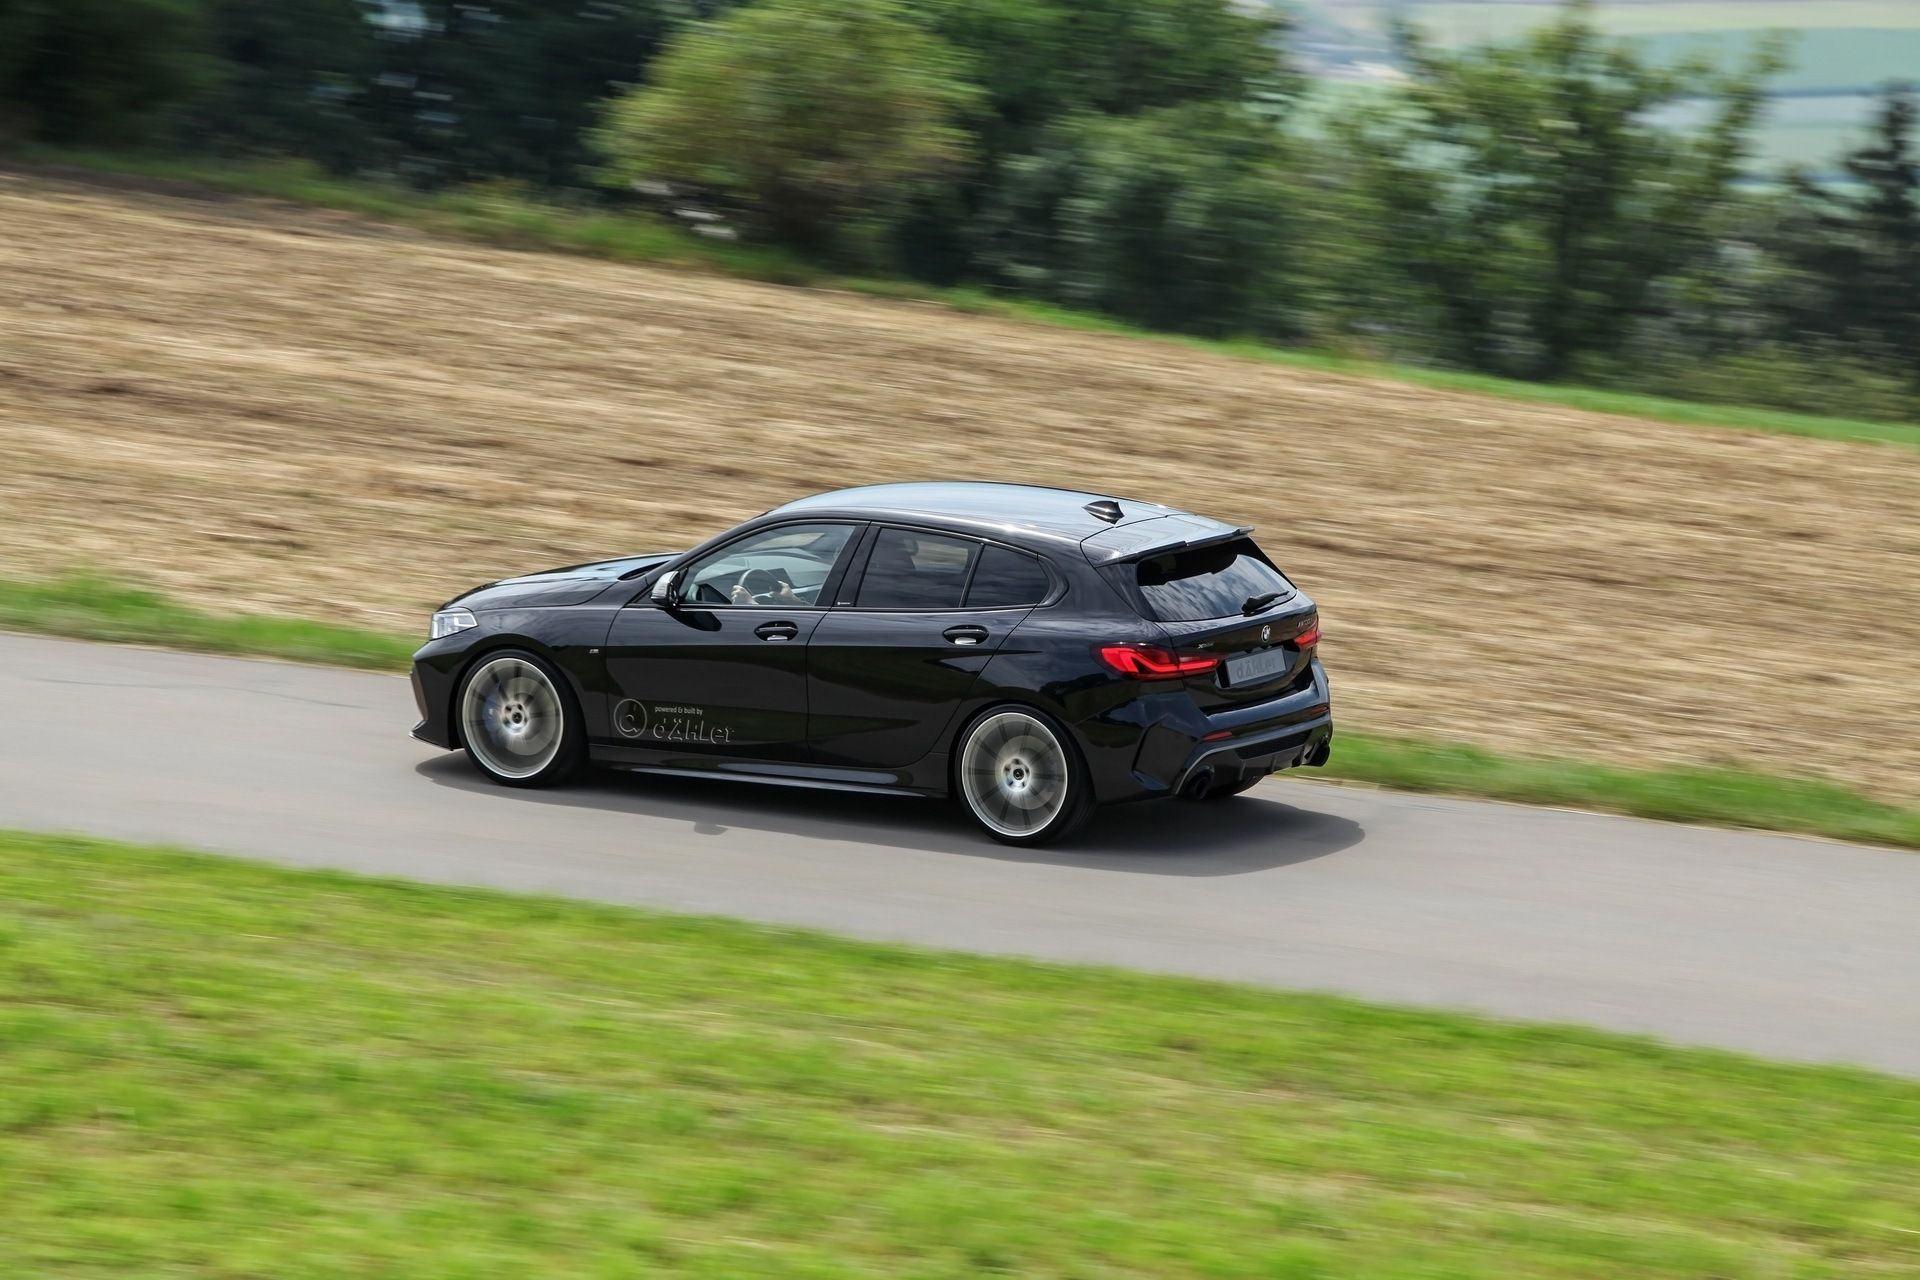 BMW_M135i_by_Dahler_0022